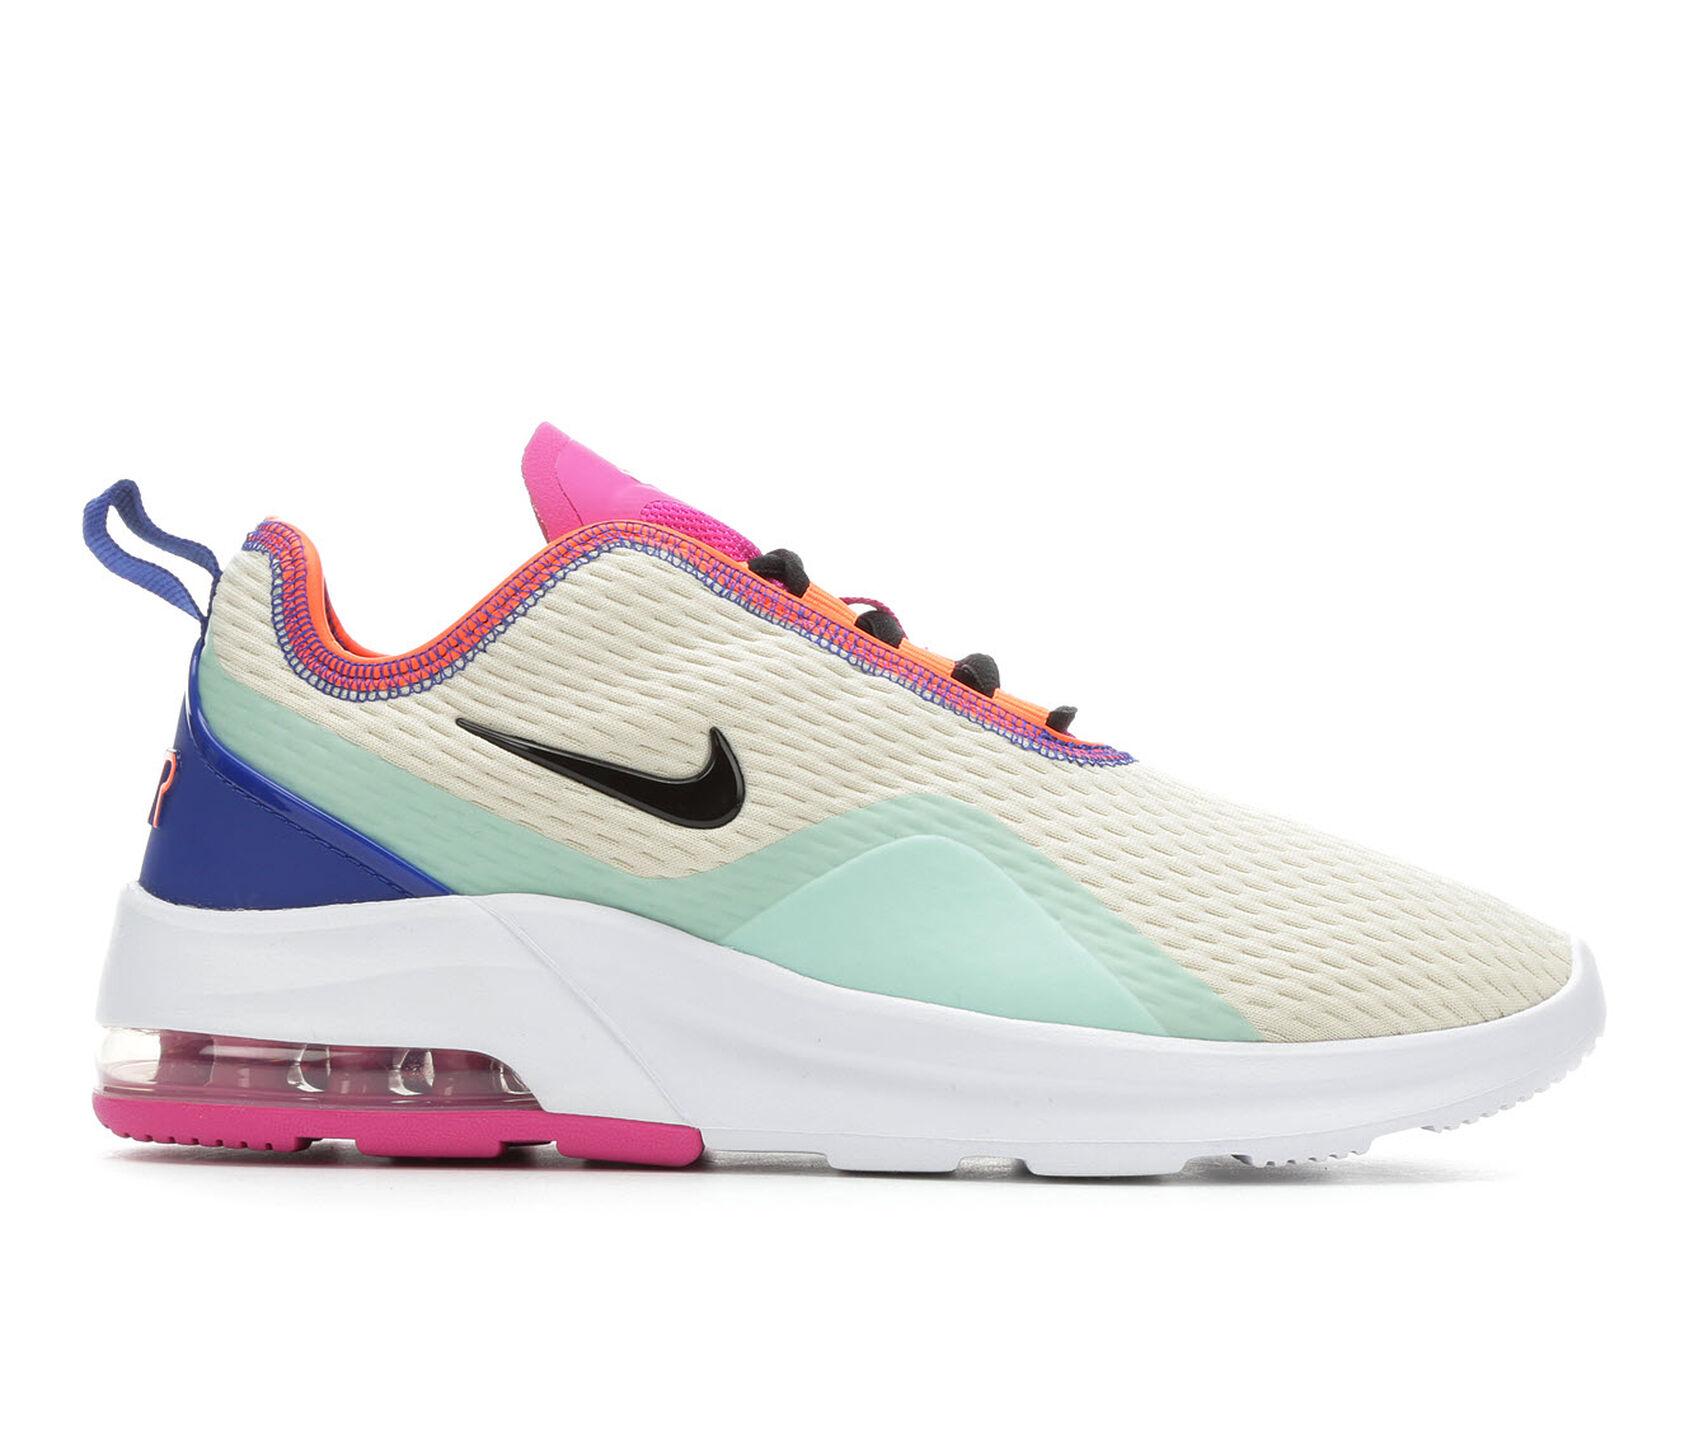 Nike Air Max Motion 2 Womens Sneakers